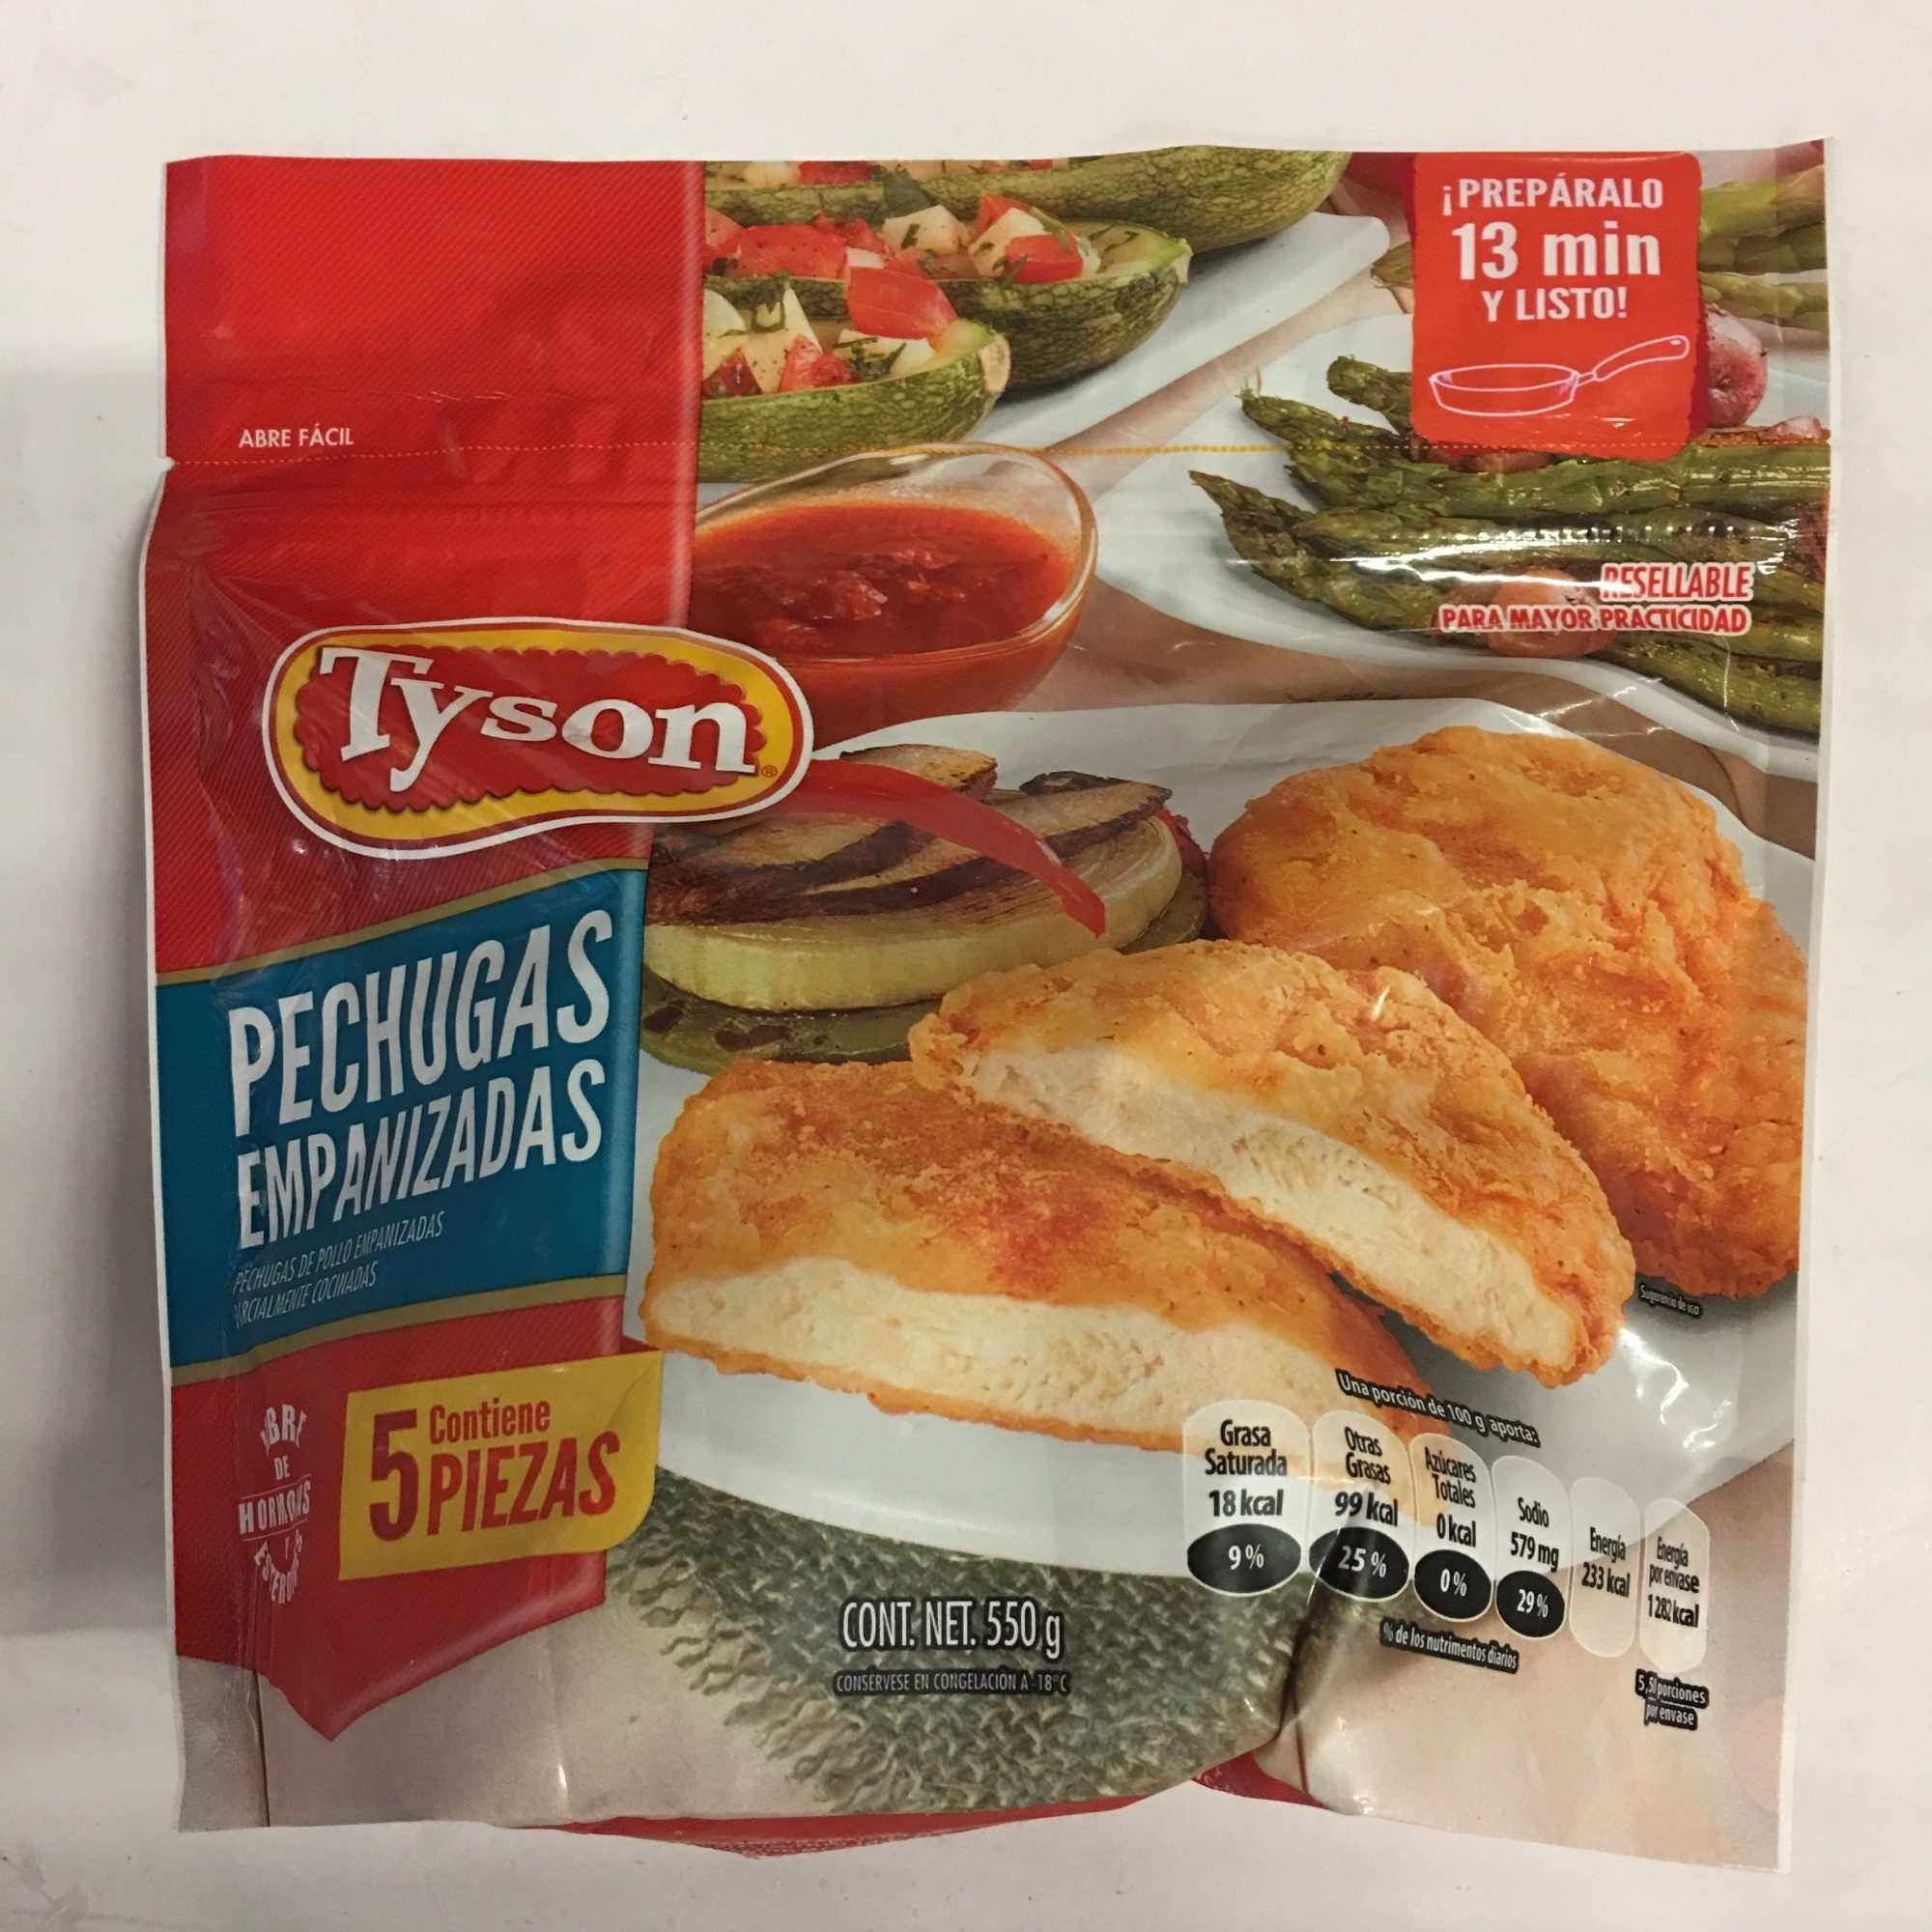 Pechugas empanizadas Tyson - Product - es